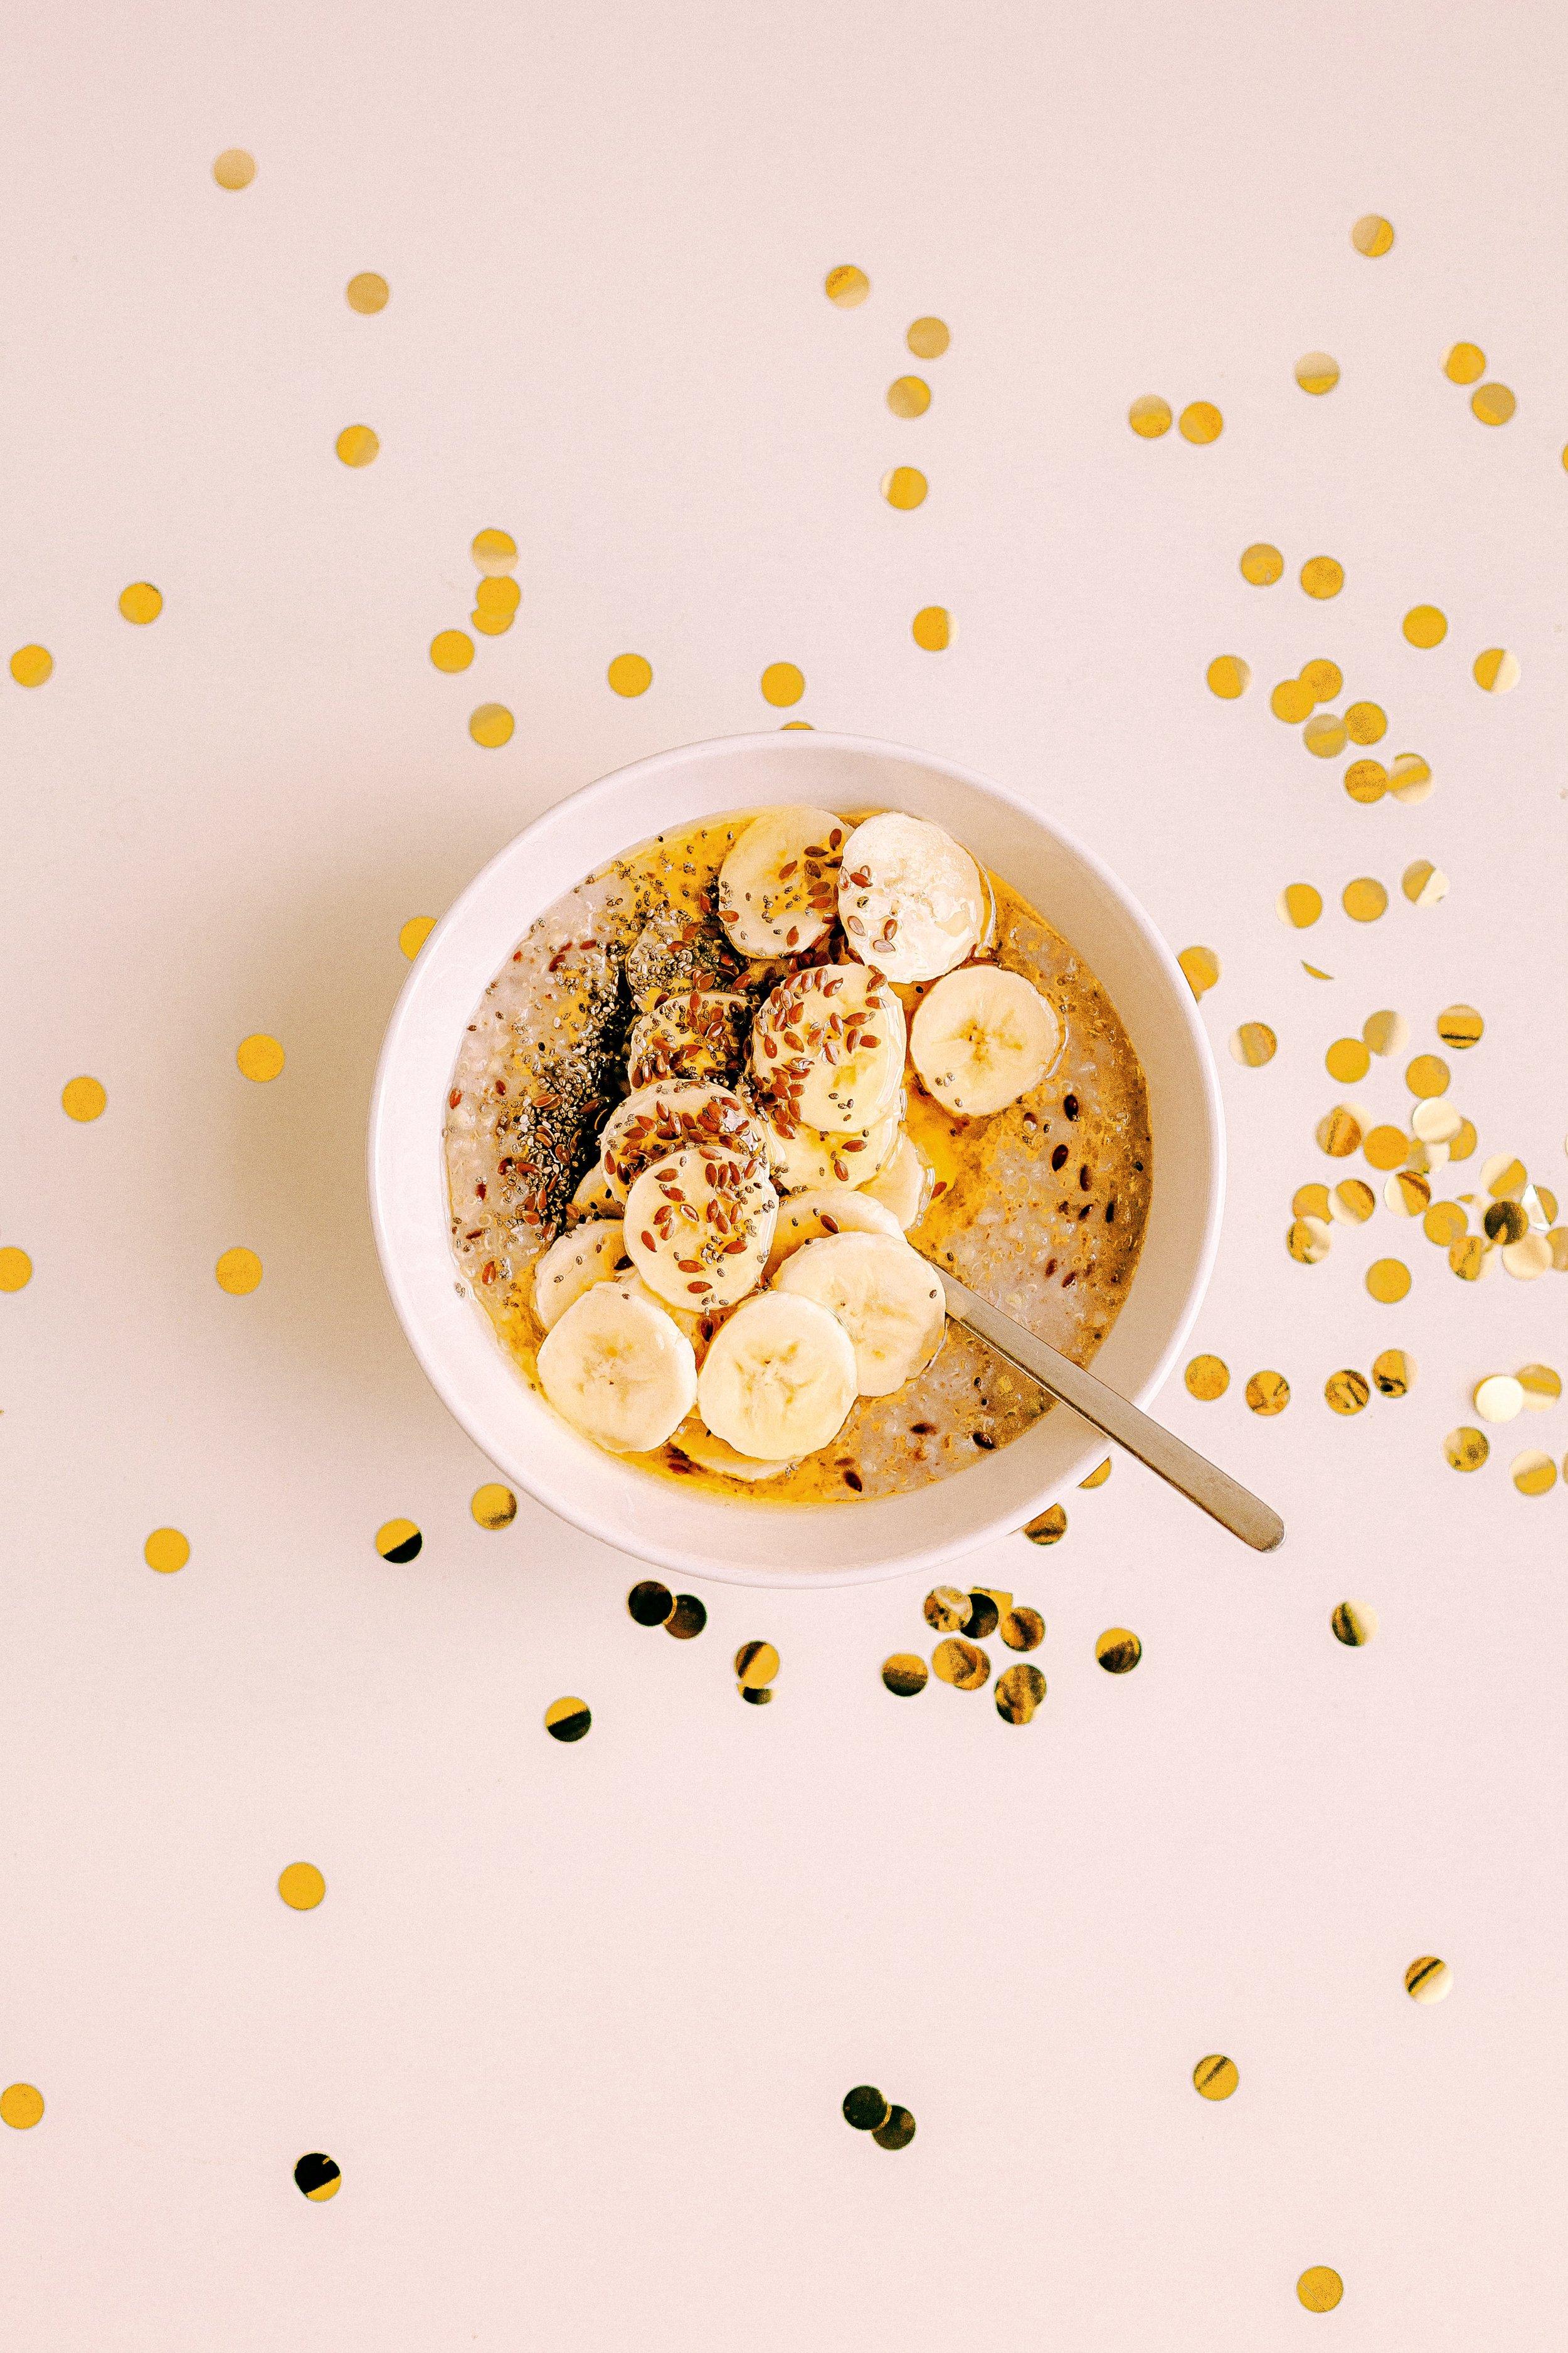 banana-bowl-delicious-1333746.jpg